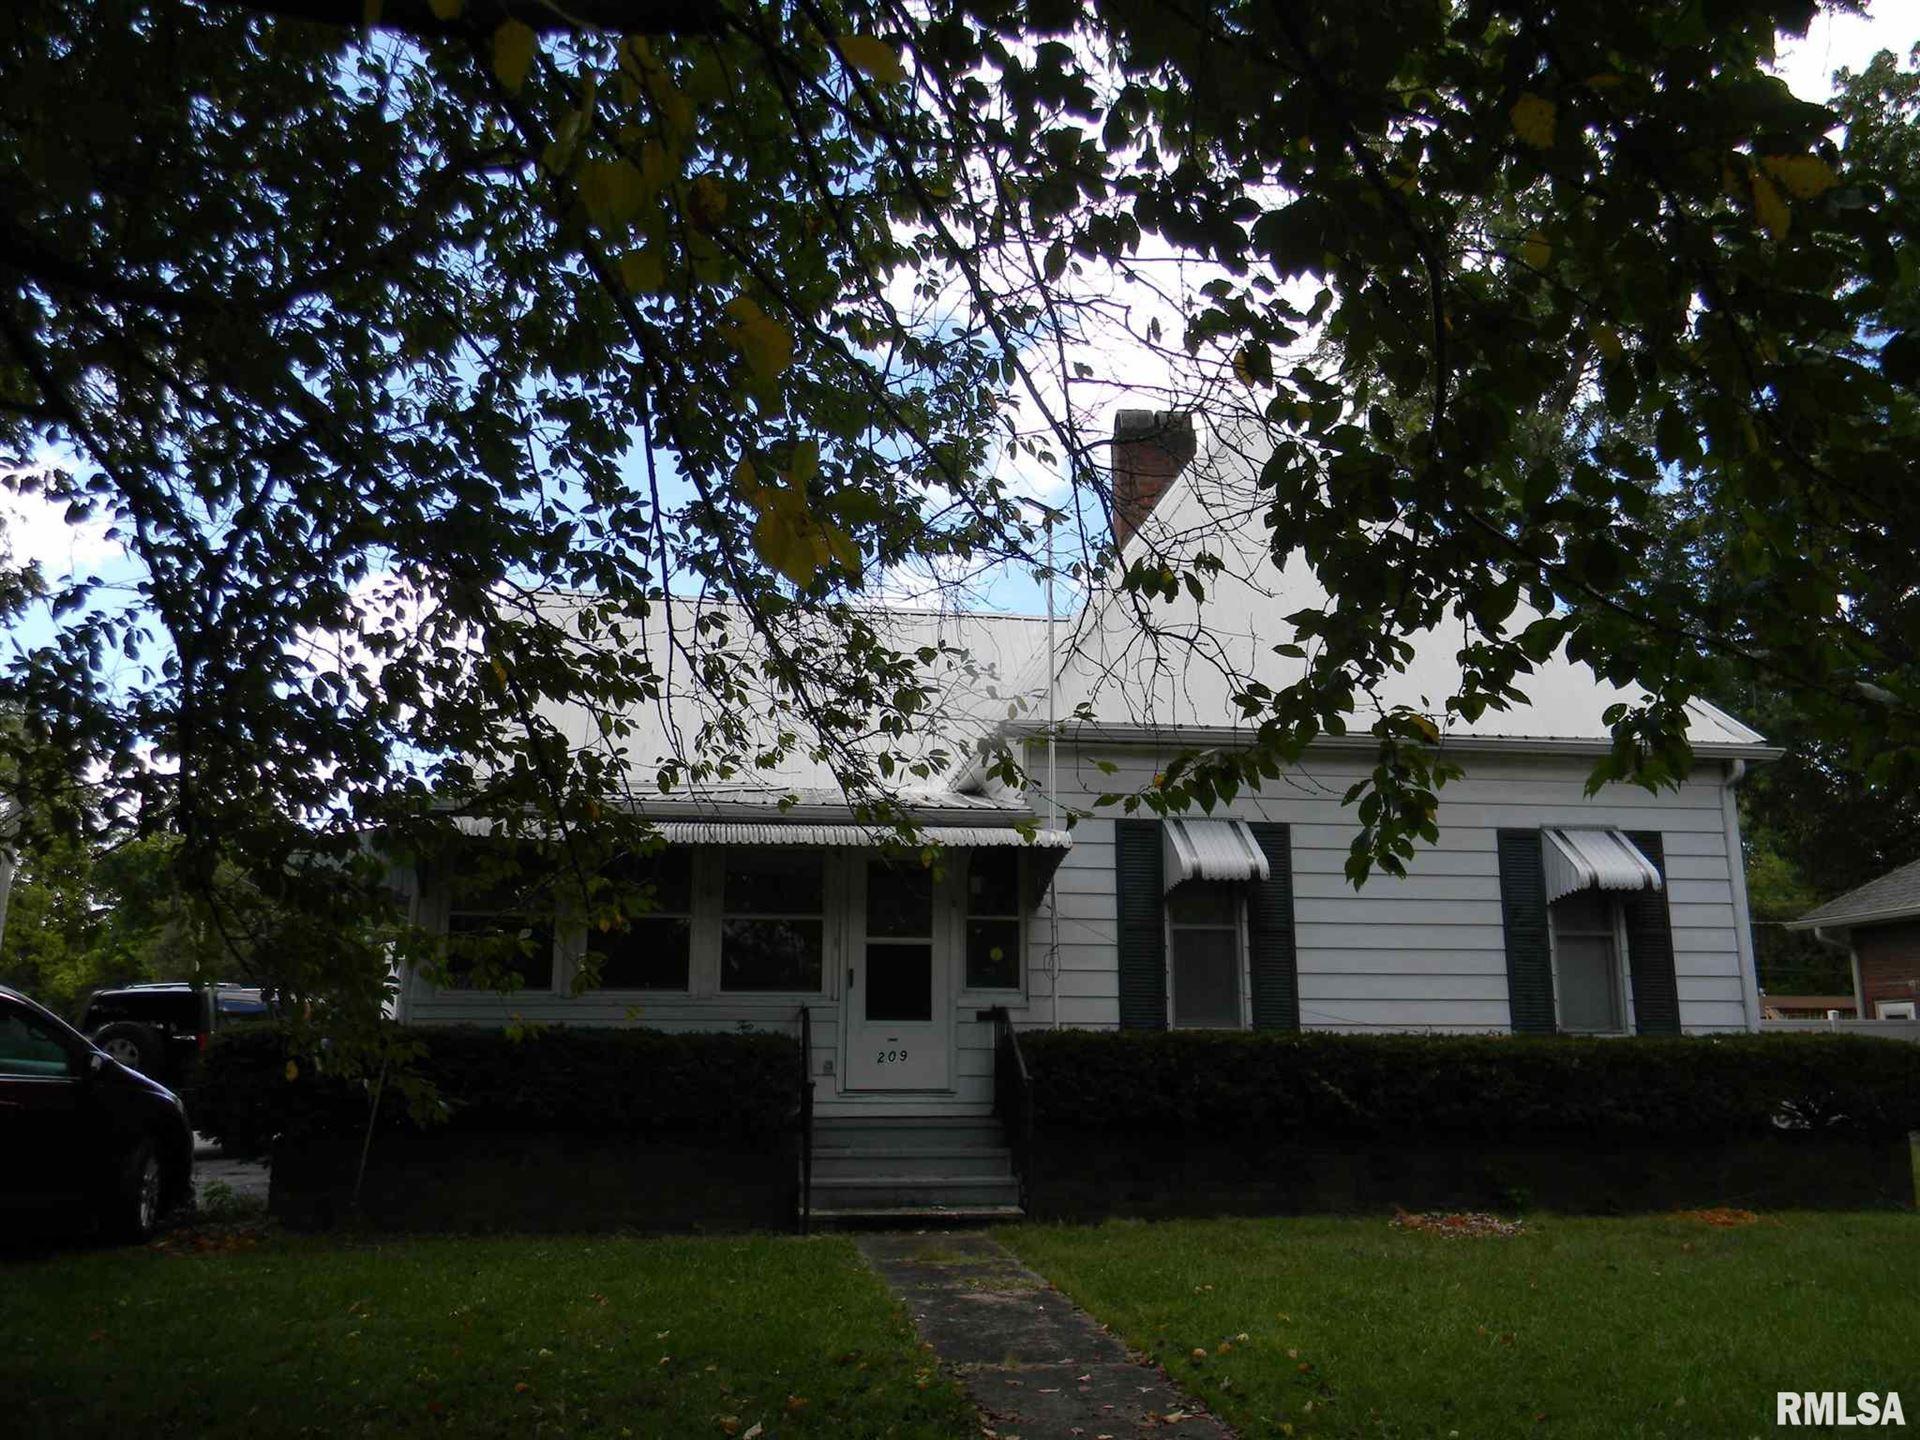 209 N MAPLE, Benton, IL 62812 - MLS#: EB441611